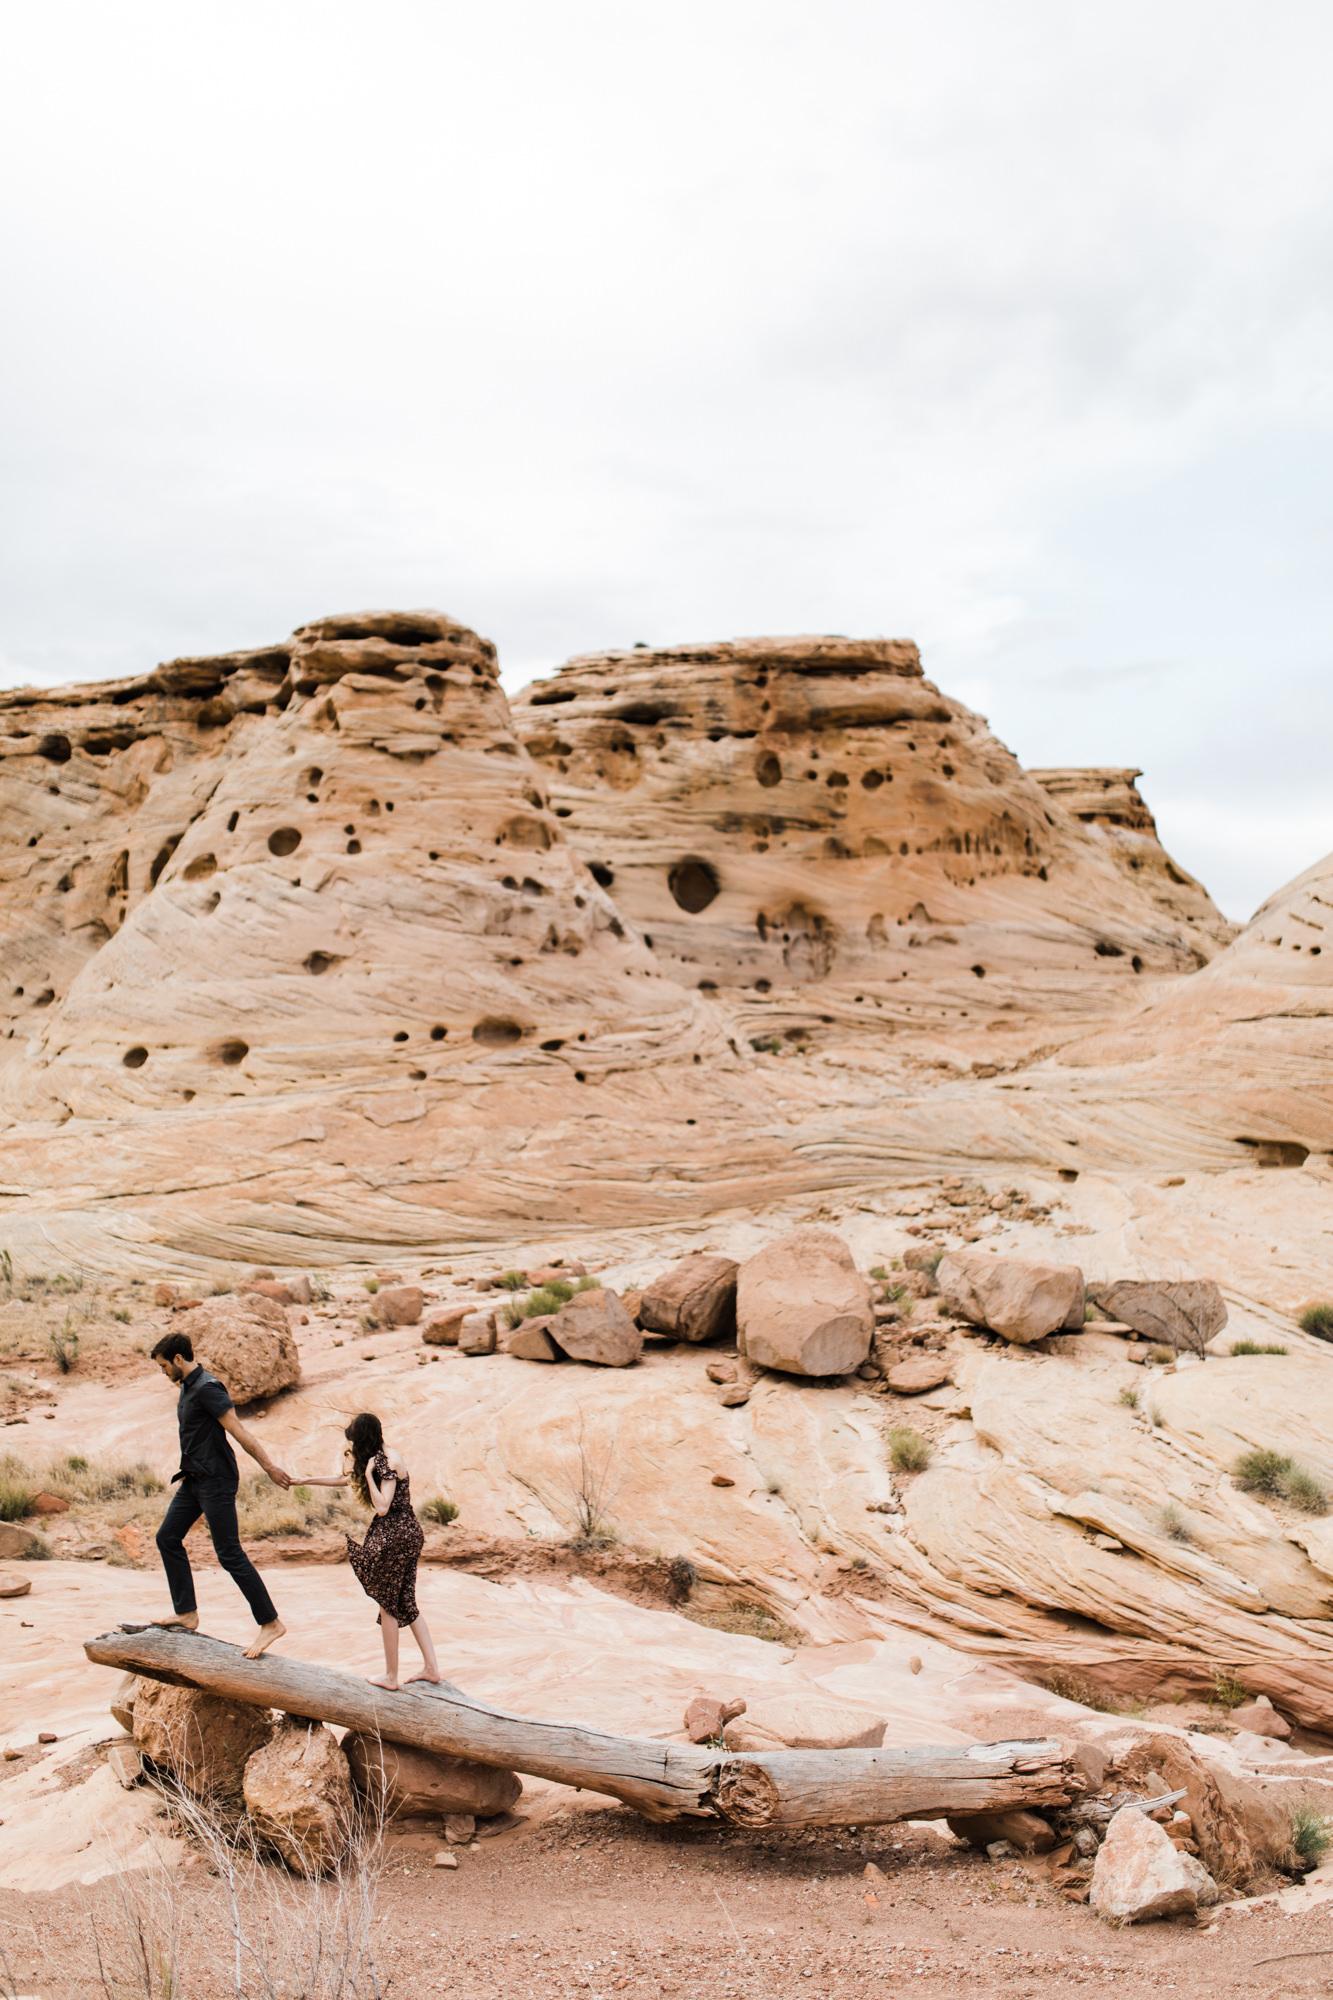 adventure engagement session in the utah desert  | destination engagement photo inspiration | utah adventure elopement photographers | the hearnes adventure photography | www.thehearnes.com